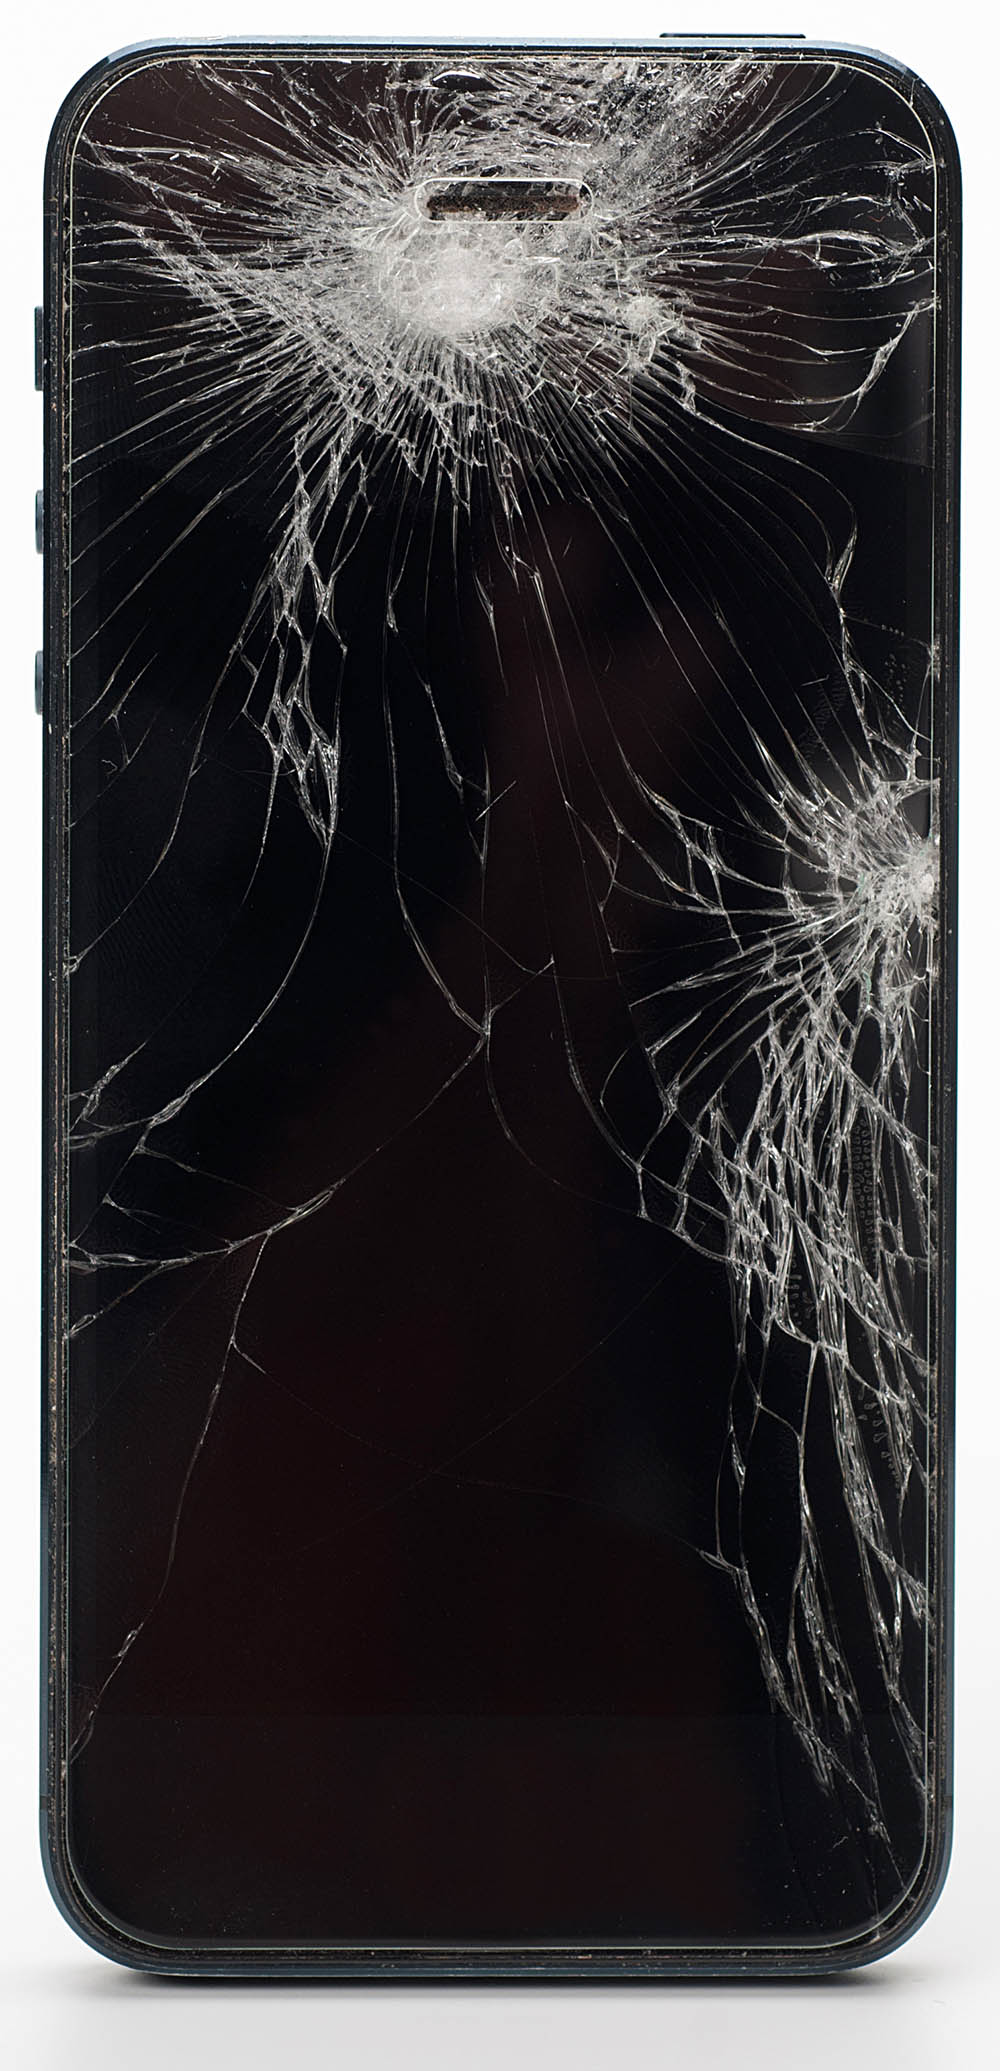 Laga mobil Enskede